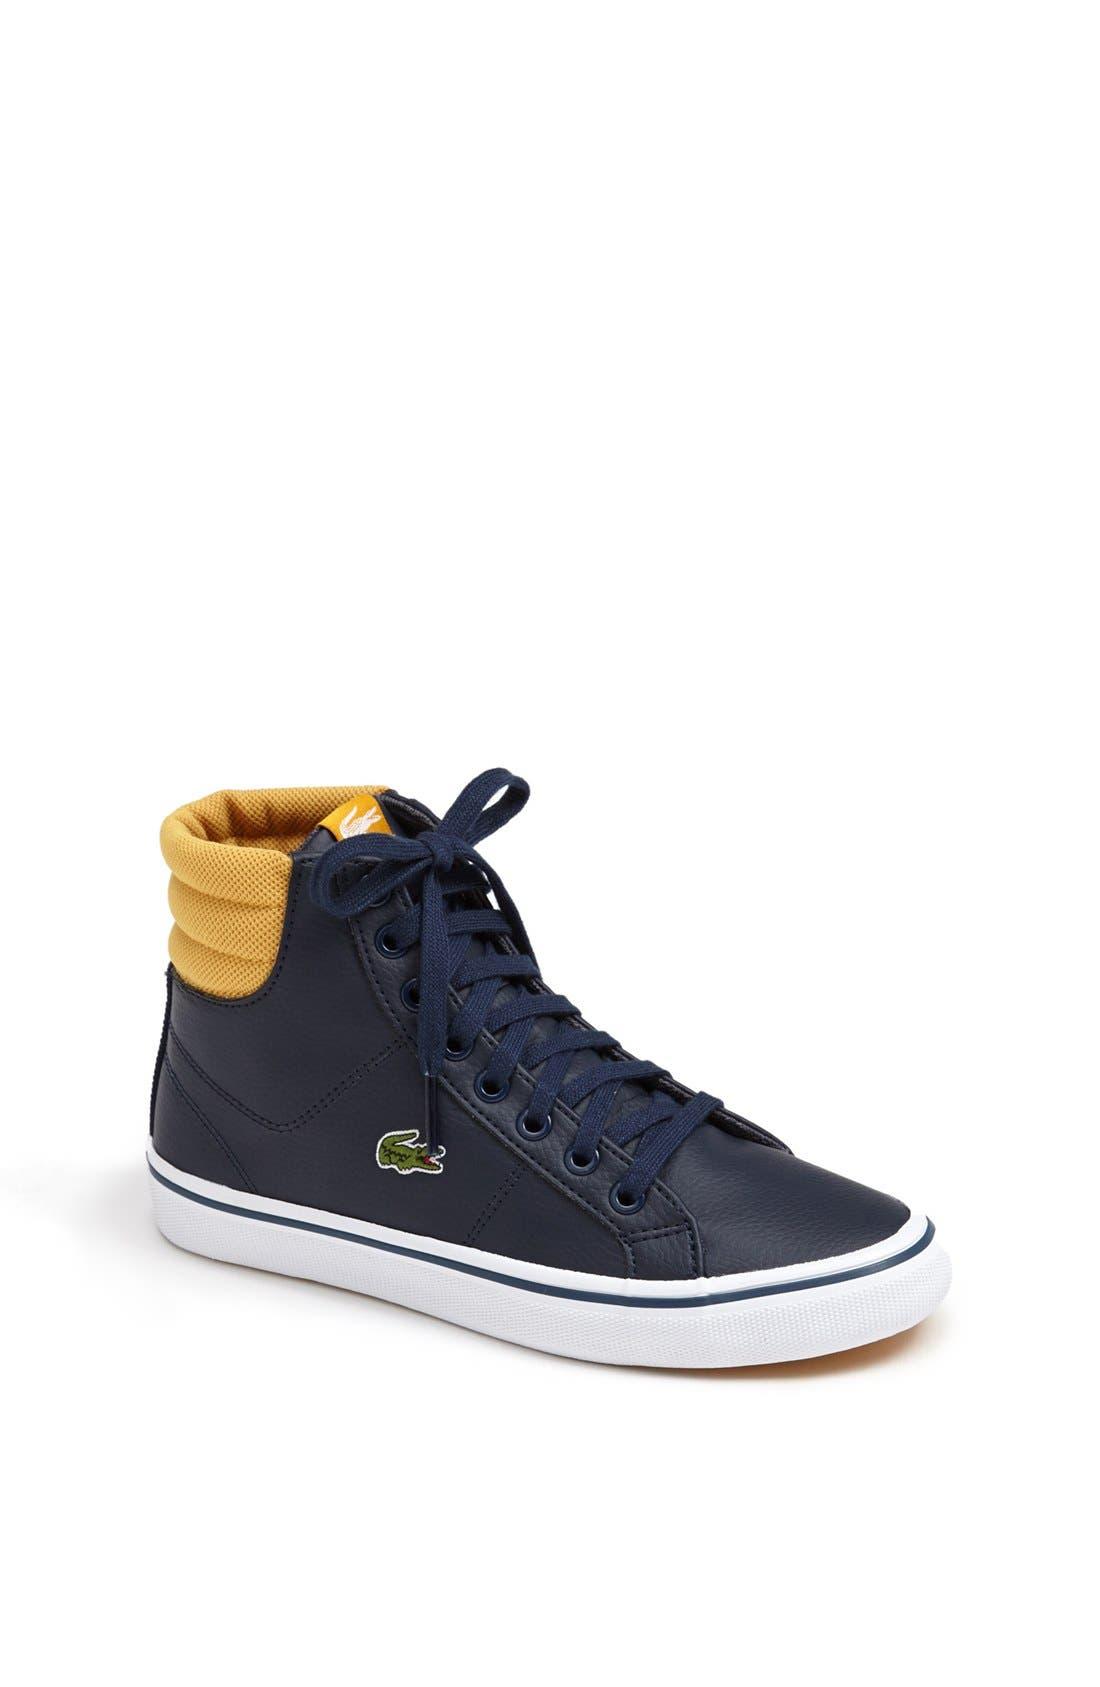 Alternate Image 1 Selected - Lacoste 'Marcel' Sneaker (Baby, Walker, Toddler, Little Kid & Big Kid)